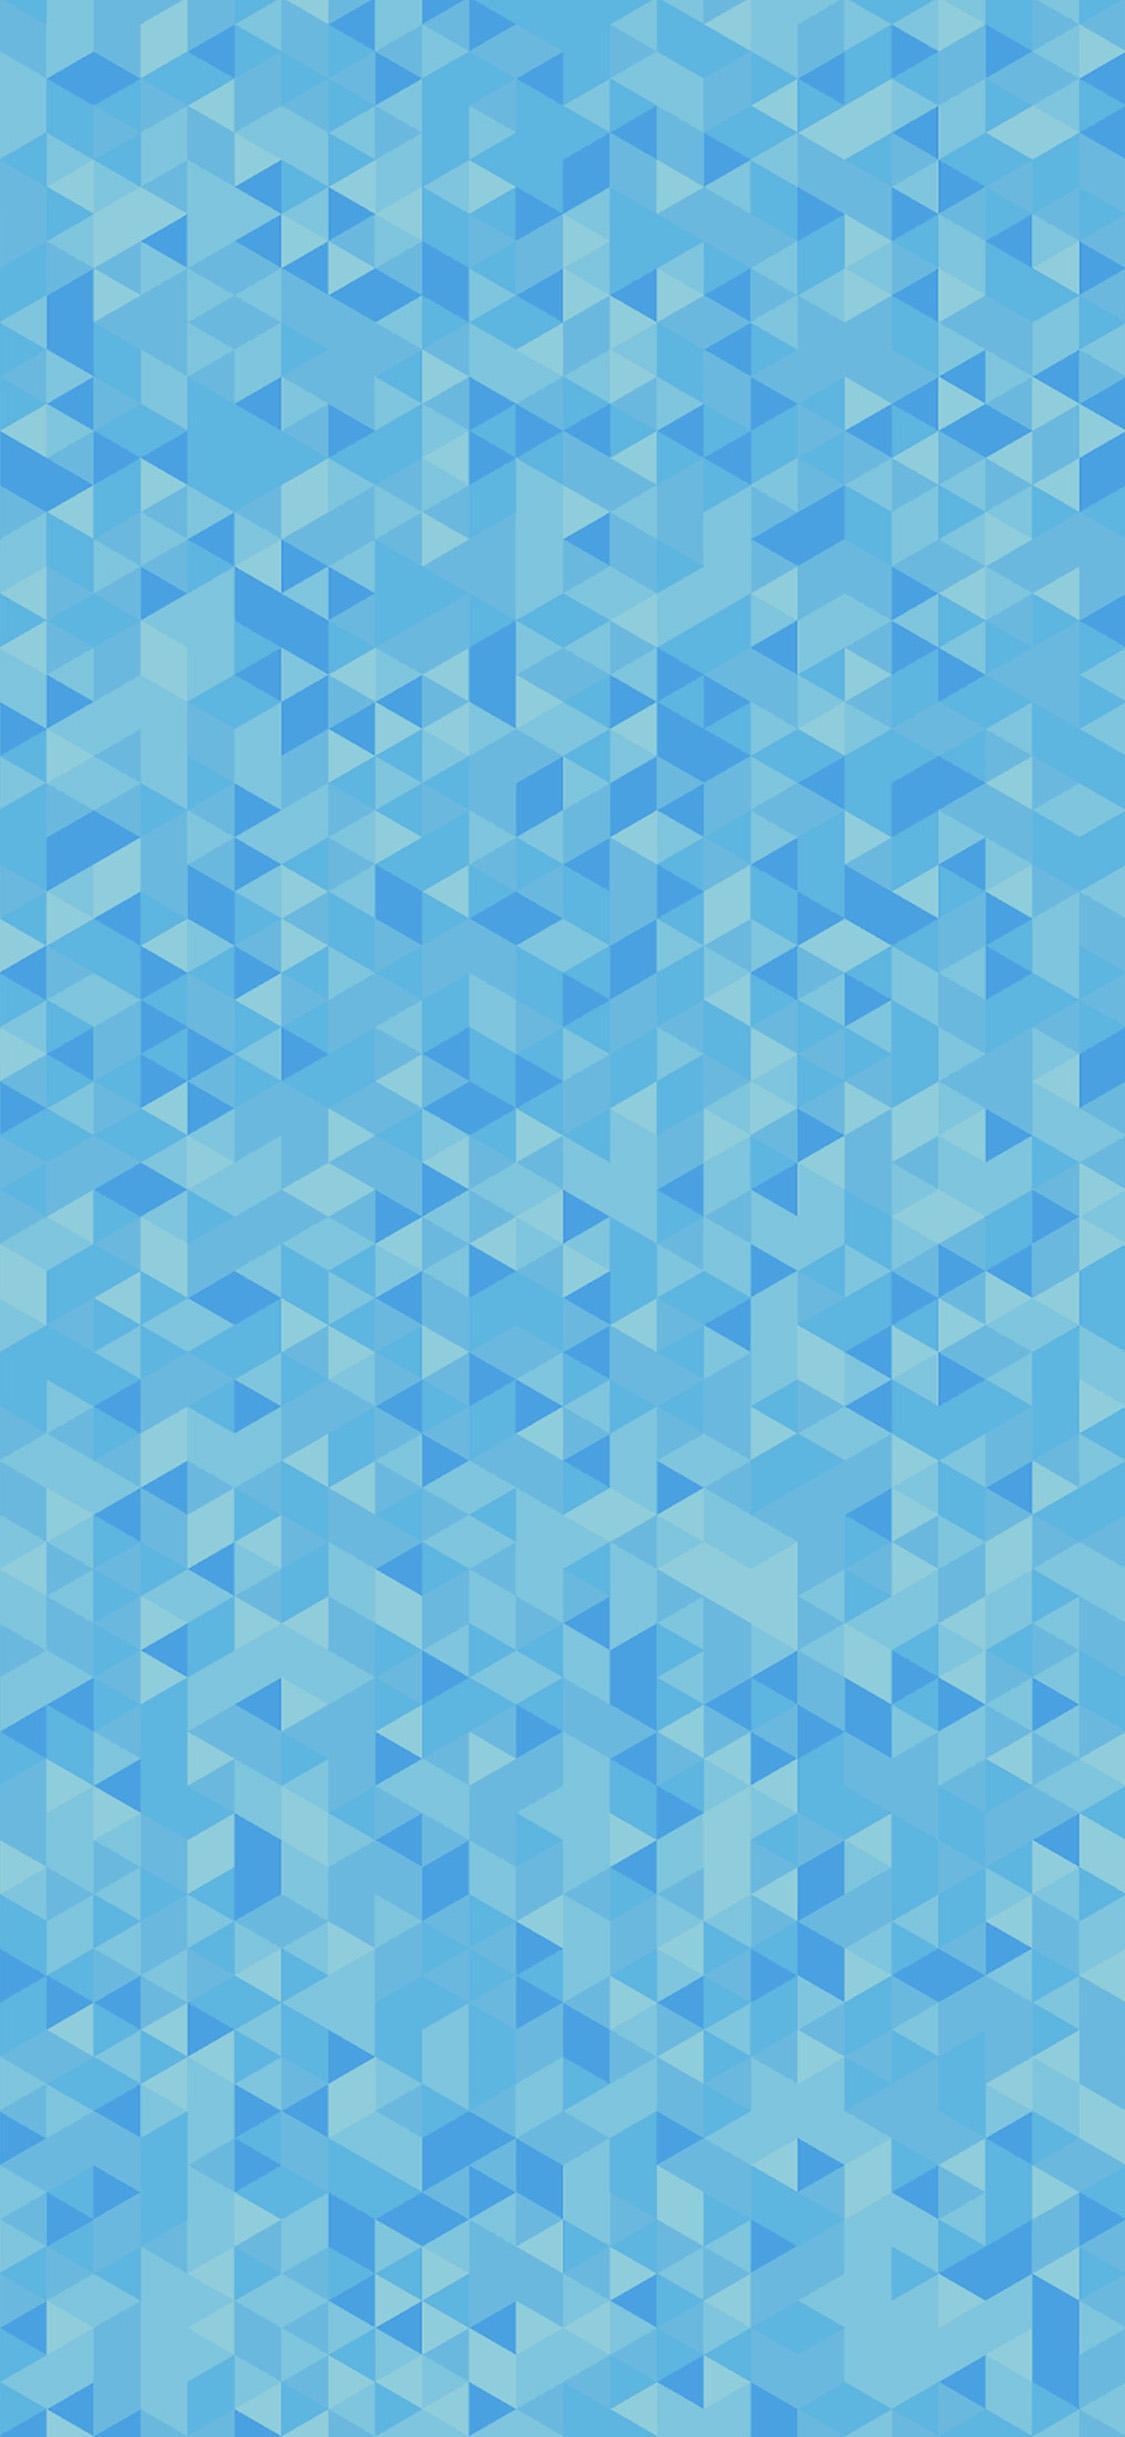 Blue Diamond Wallpapers Top Free Blue Diamond Backgrounds